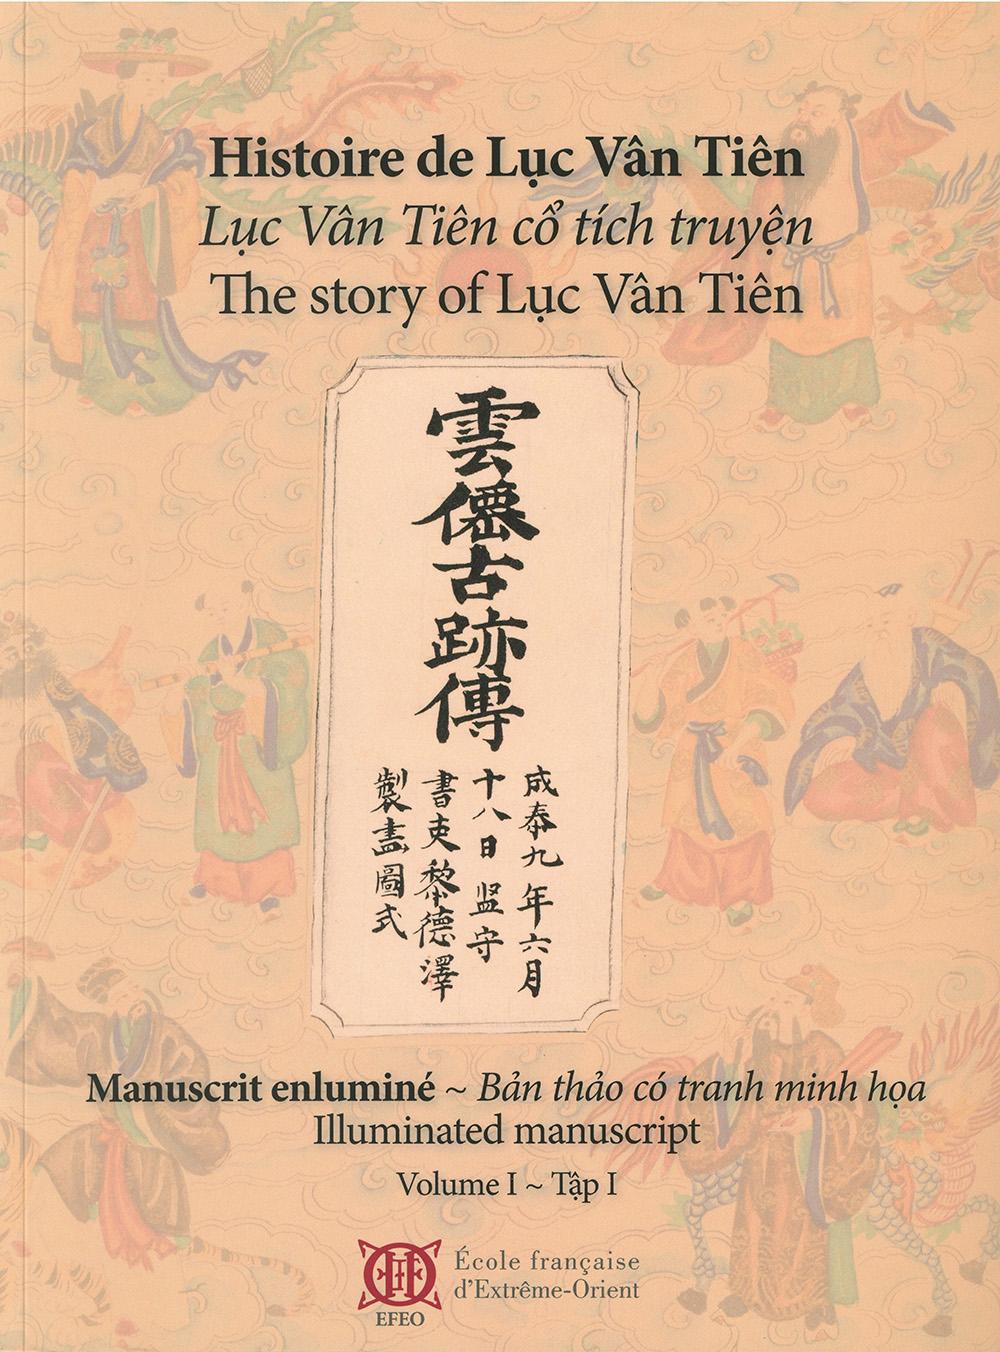 Histoire de Lục Vân Tiên